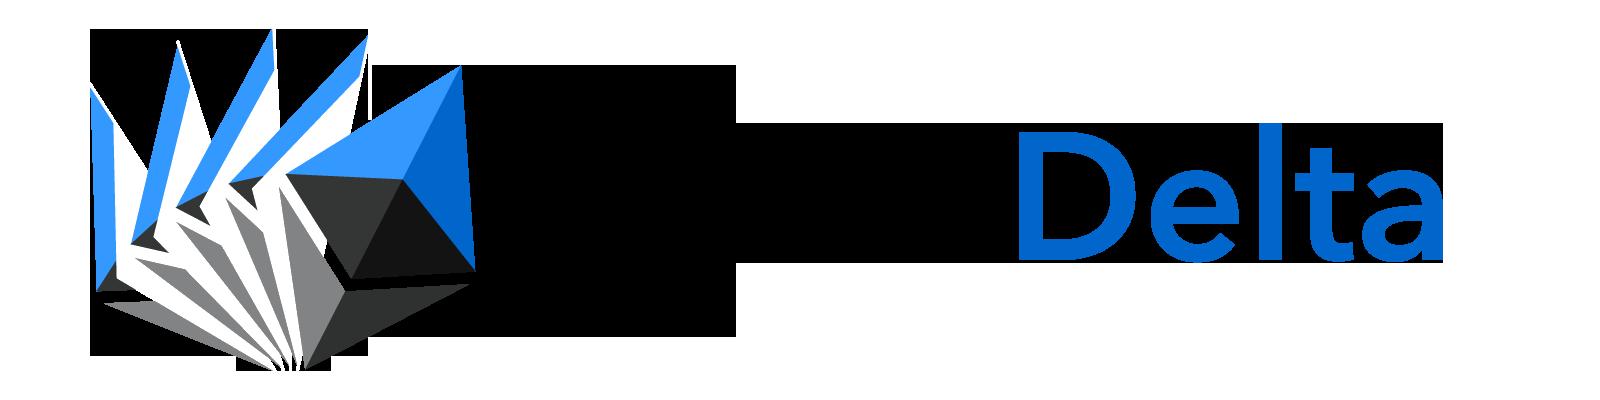 etherdelta logo grayscale